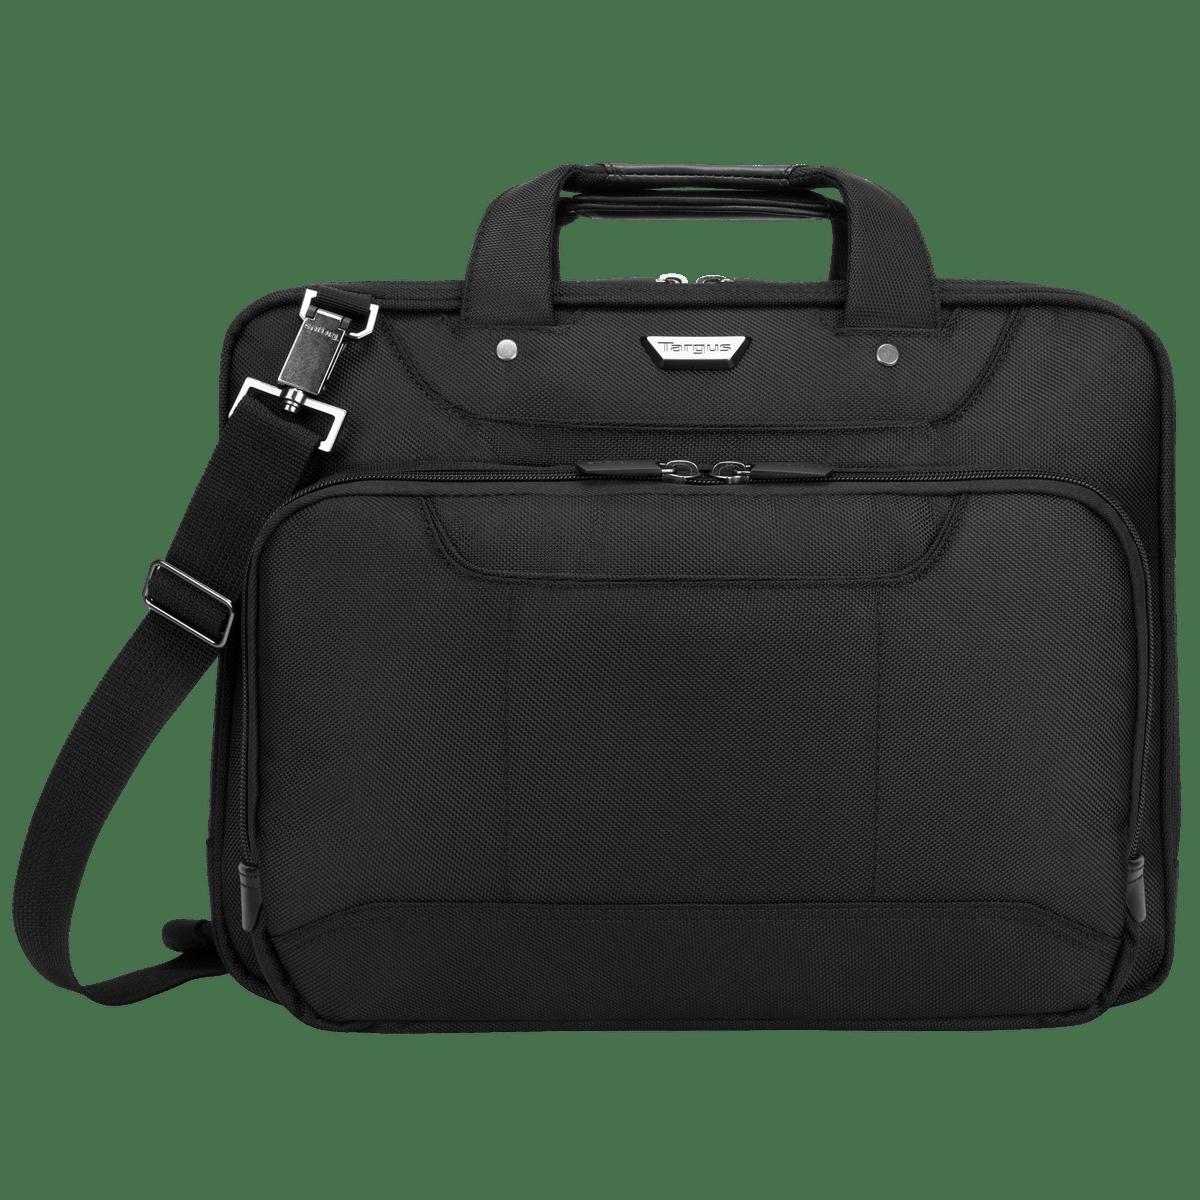 LAPTOP BAGS #laptop #laptopcase #hp #dell #asus #bags